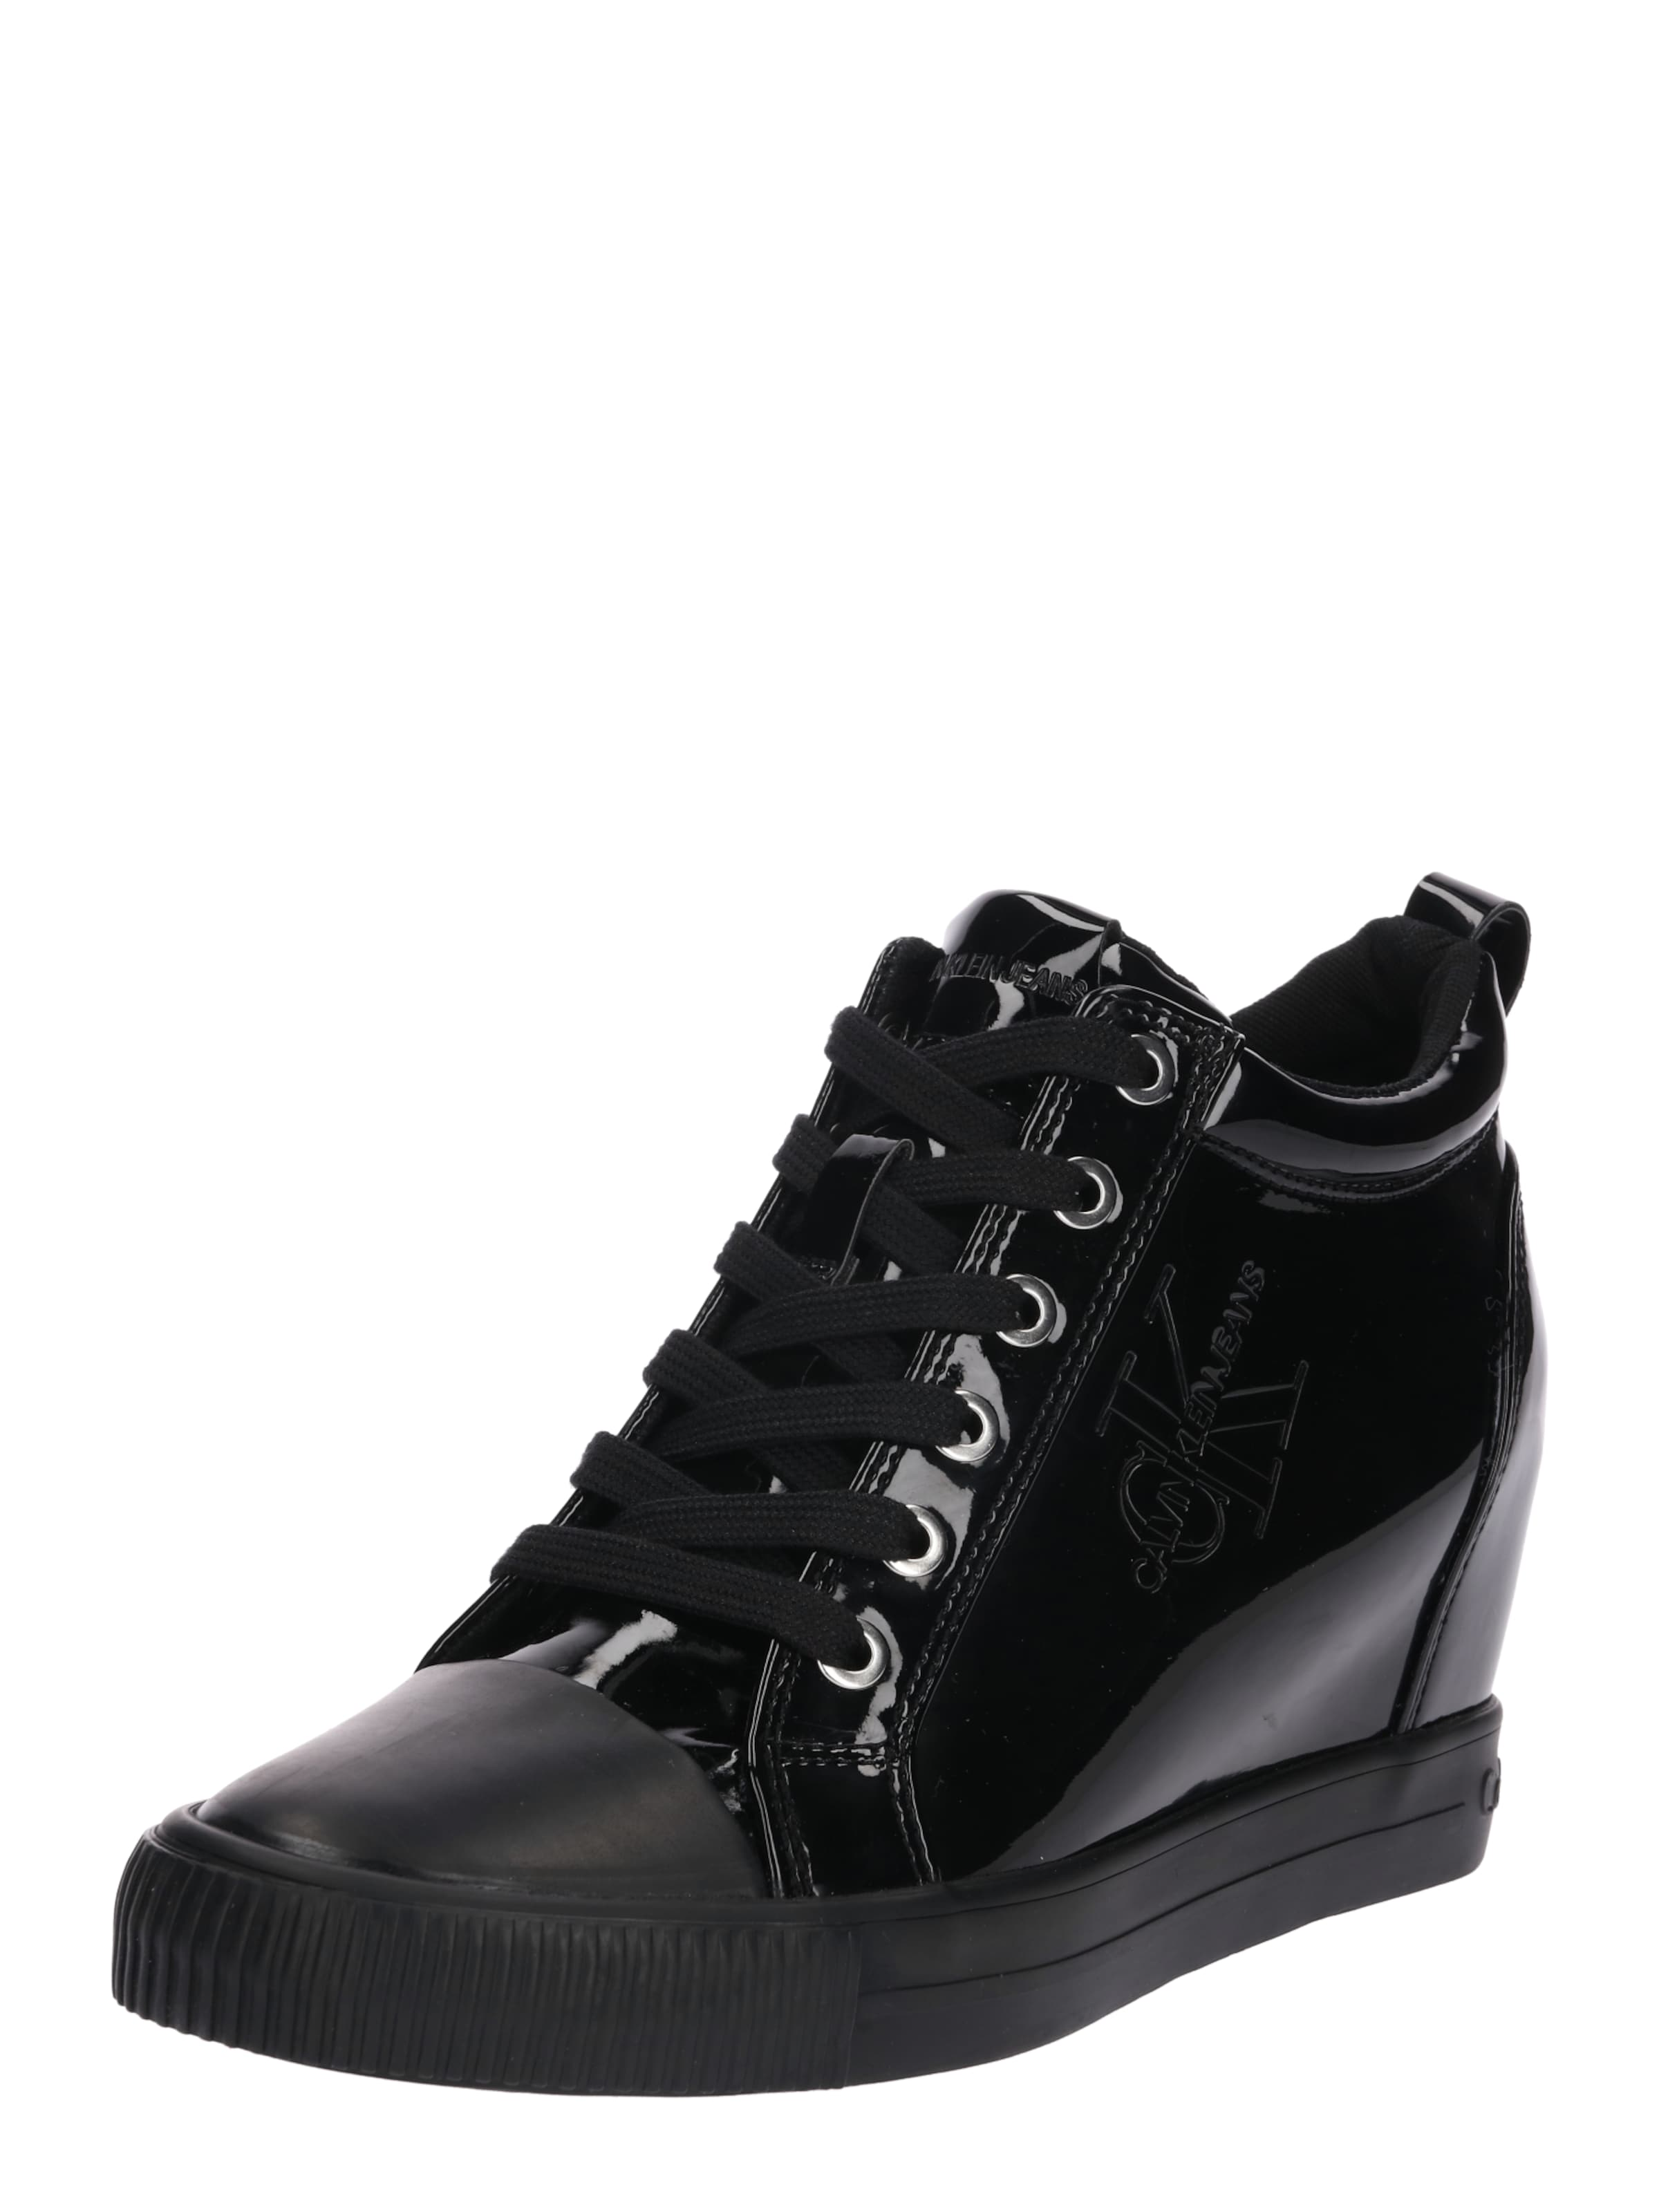 Calvin Klein Jeans | Wedge-Turnschuhe Wedge-Turnschuhe | RITZY a27711